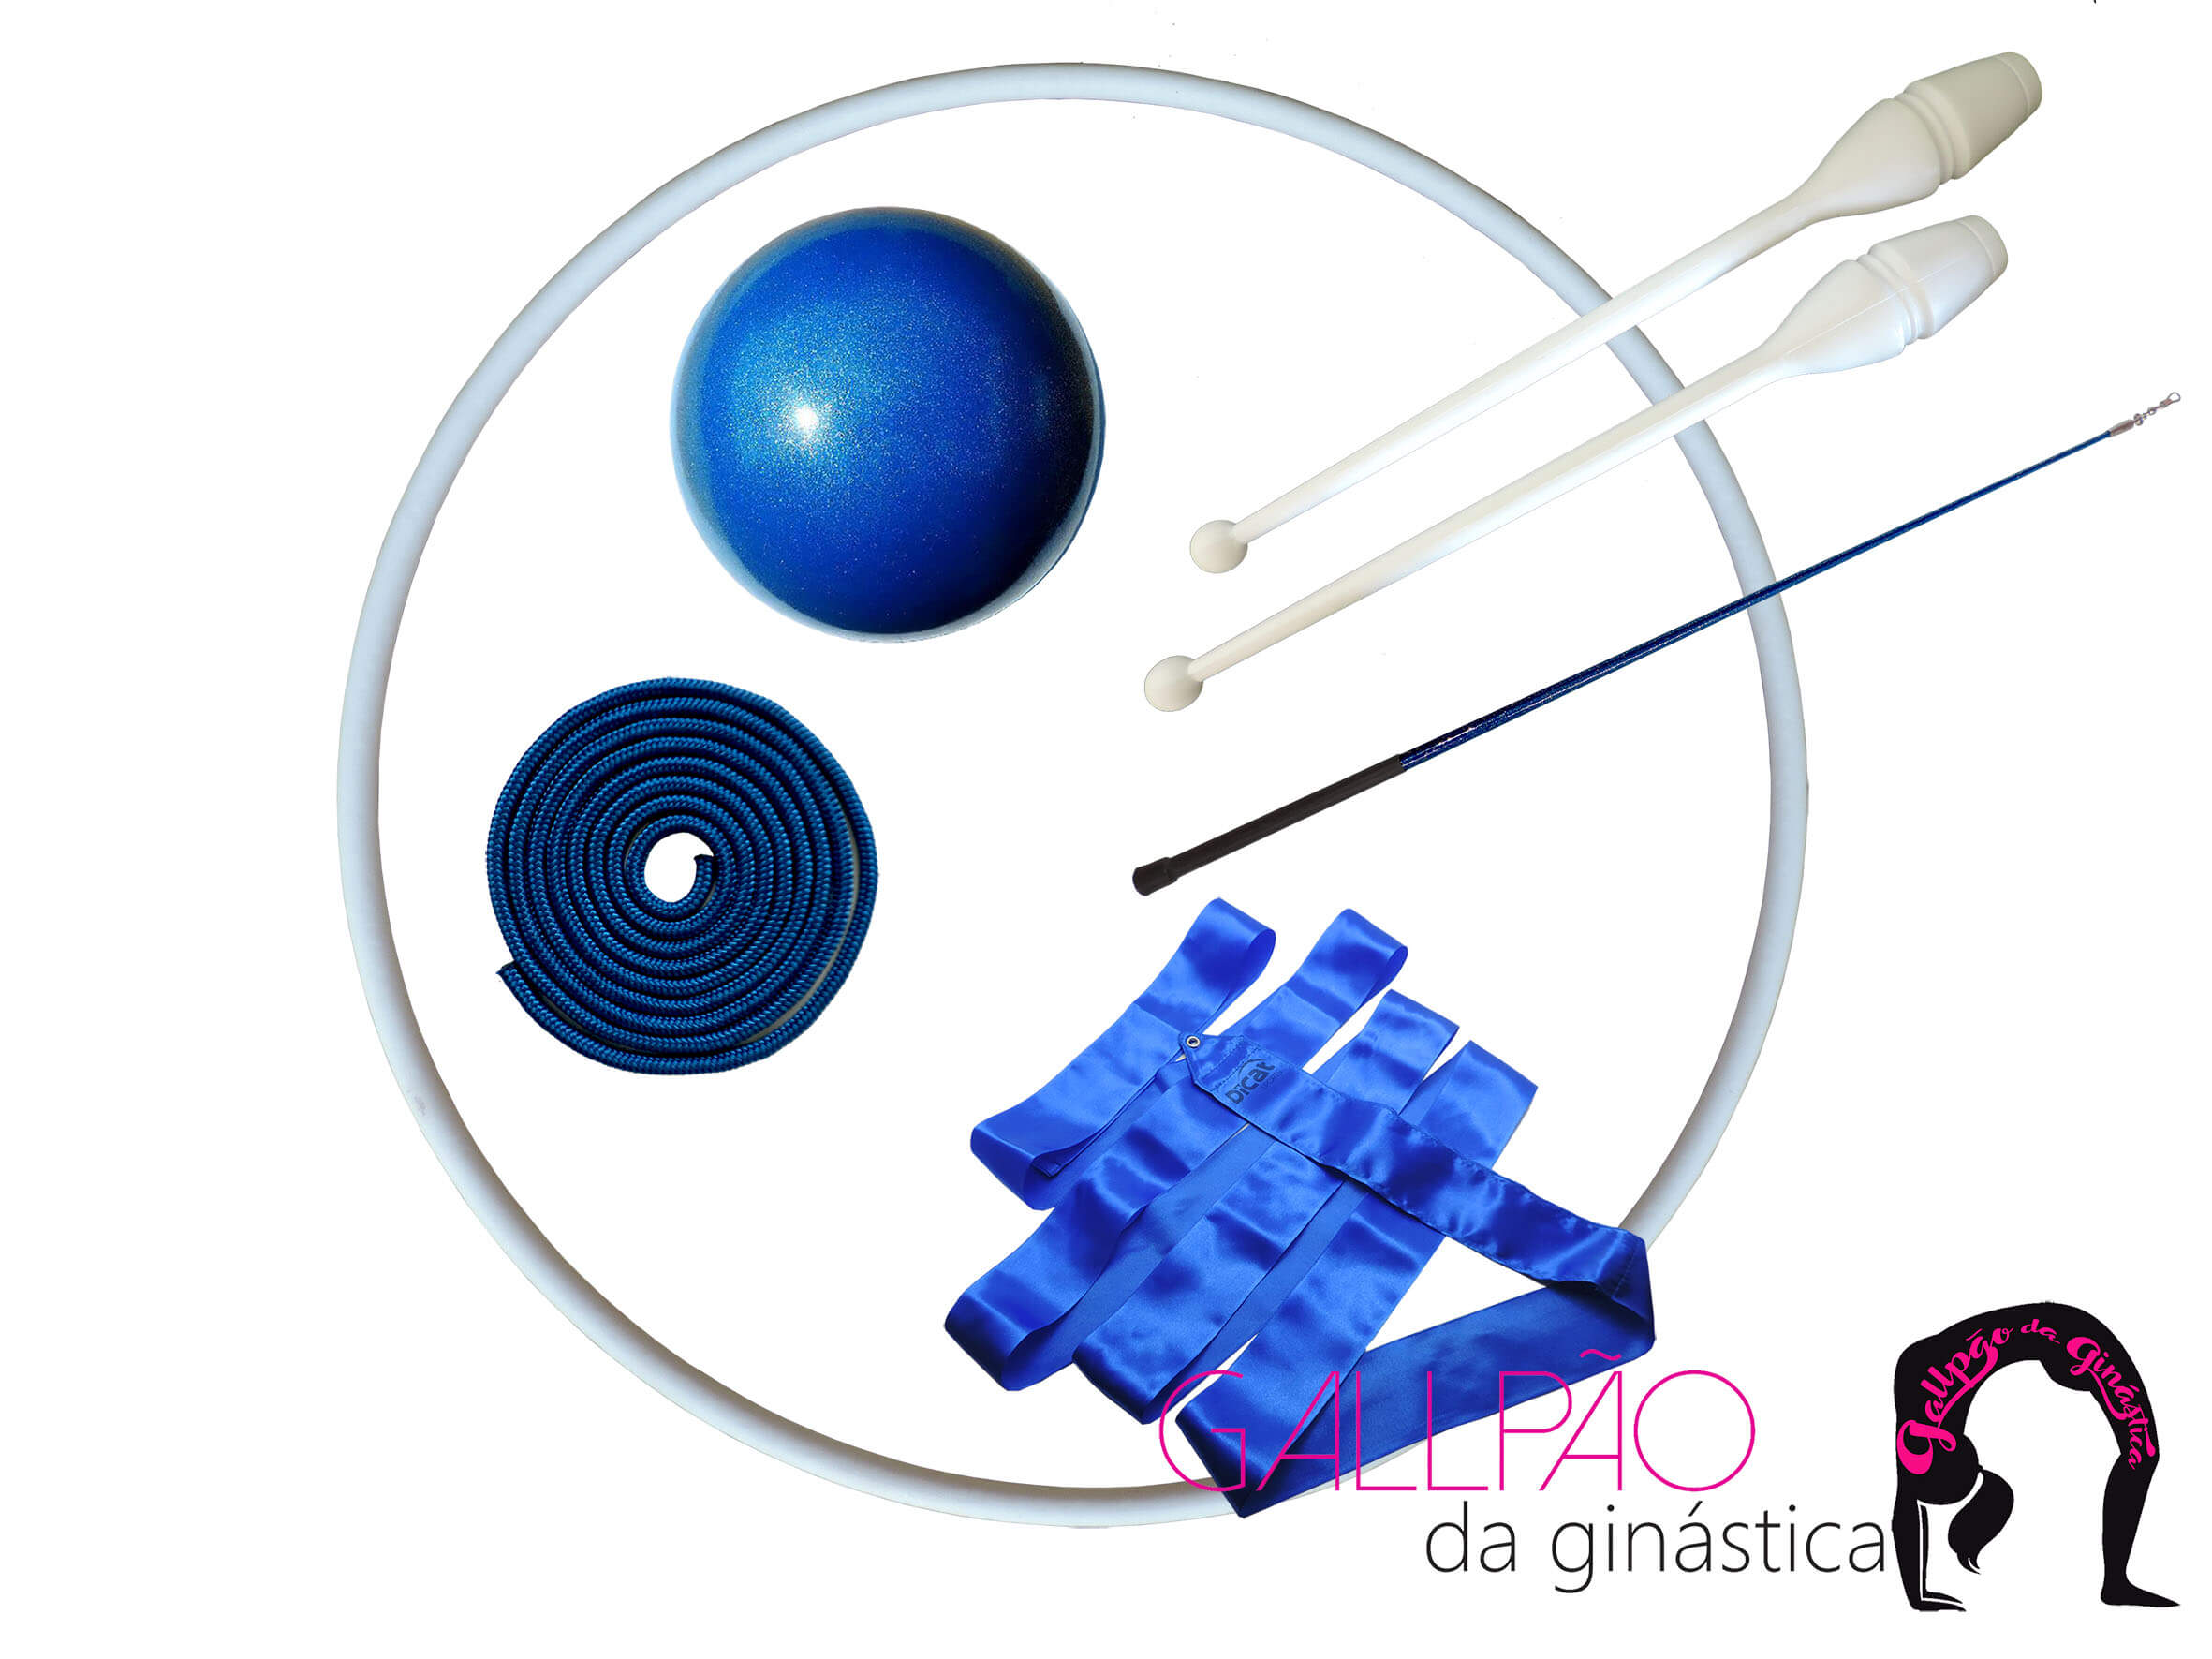 Kit Ginástica Rítmica Azul Metalizado